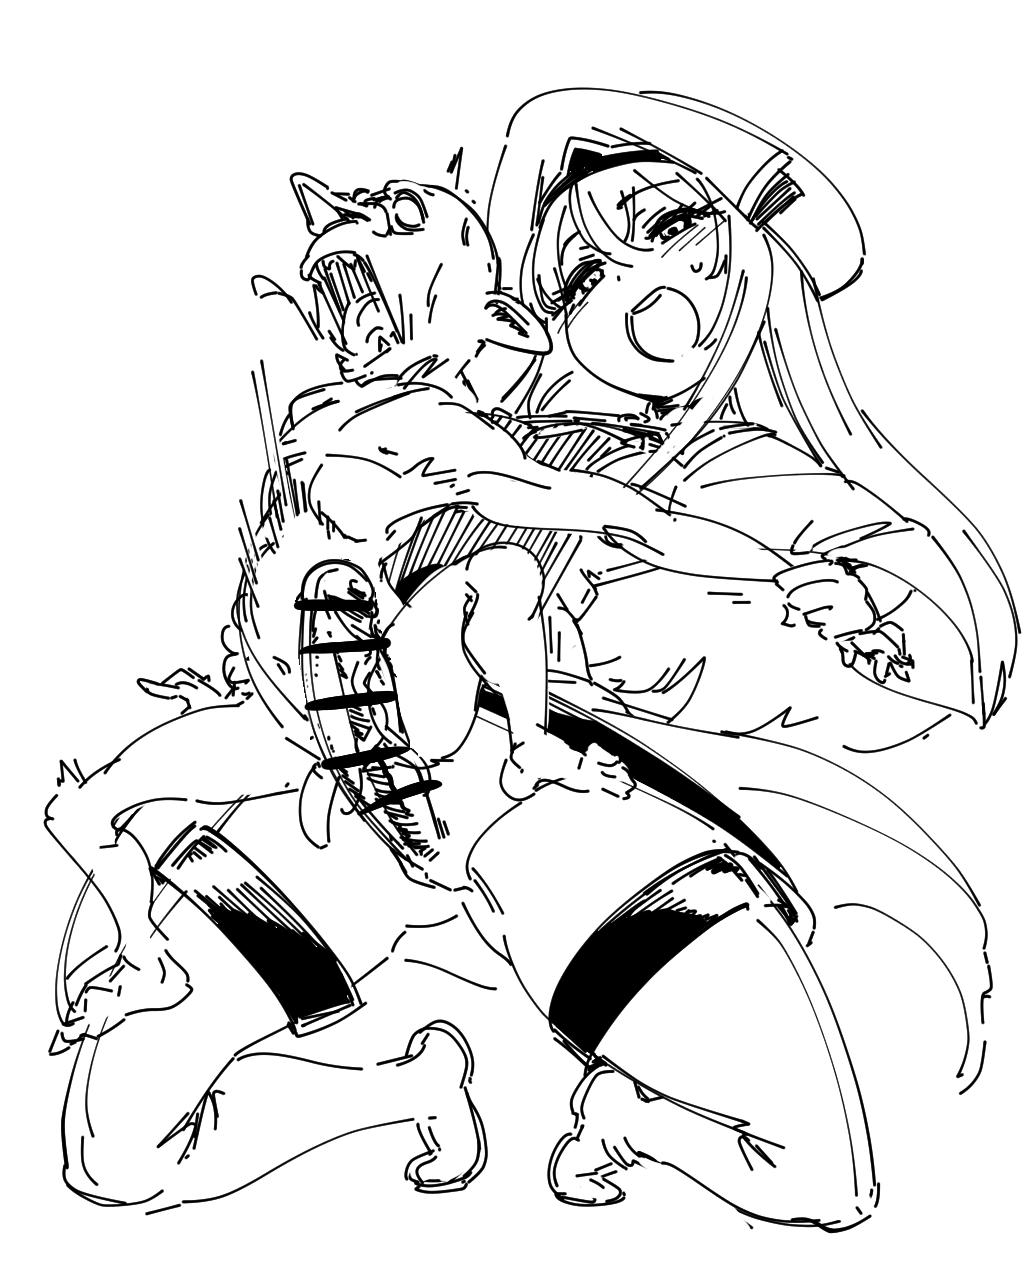 a reincarnated as slime goblin Gen:lock